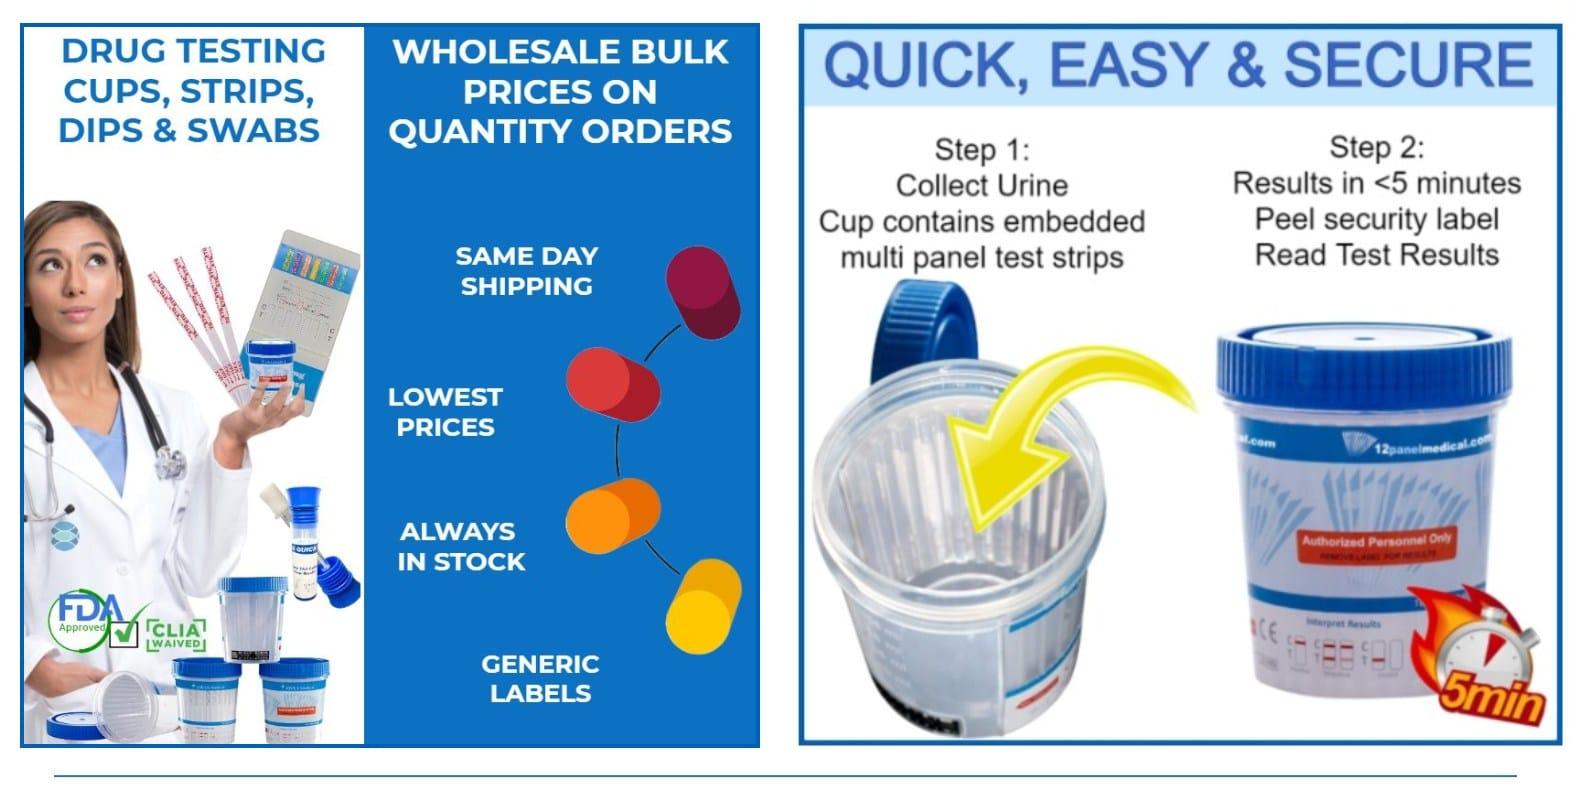 ovus medical urine drug test cups info ML